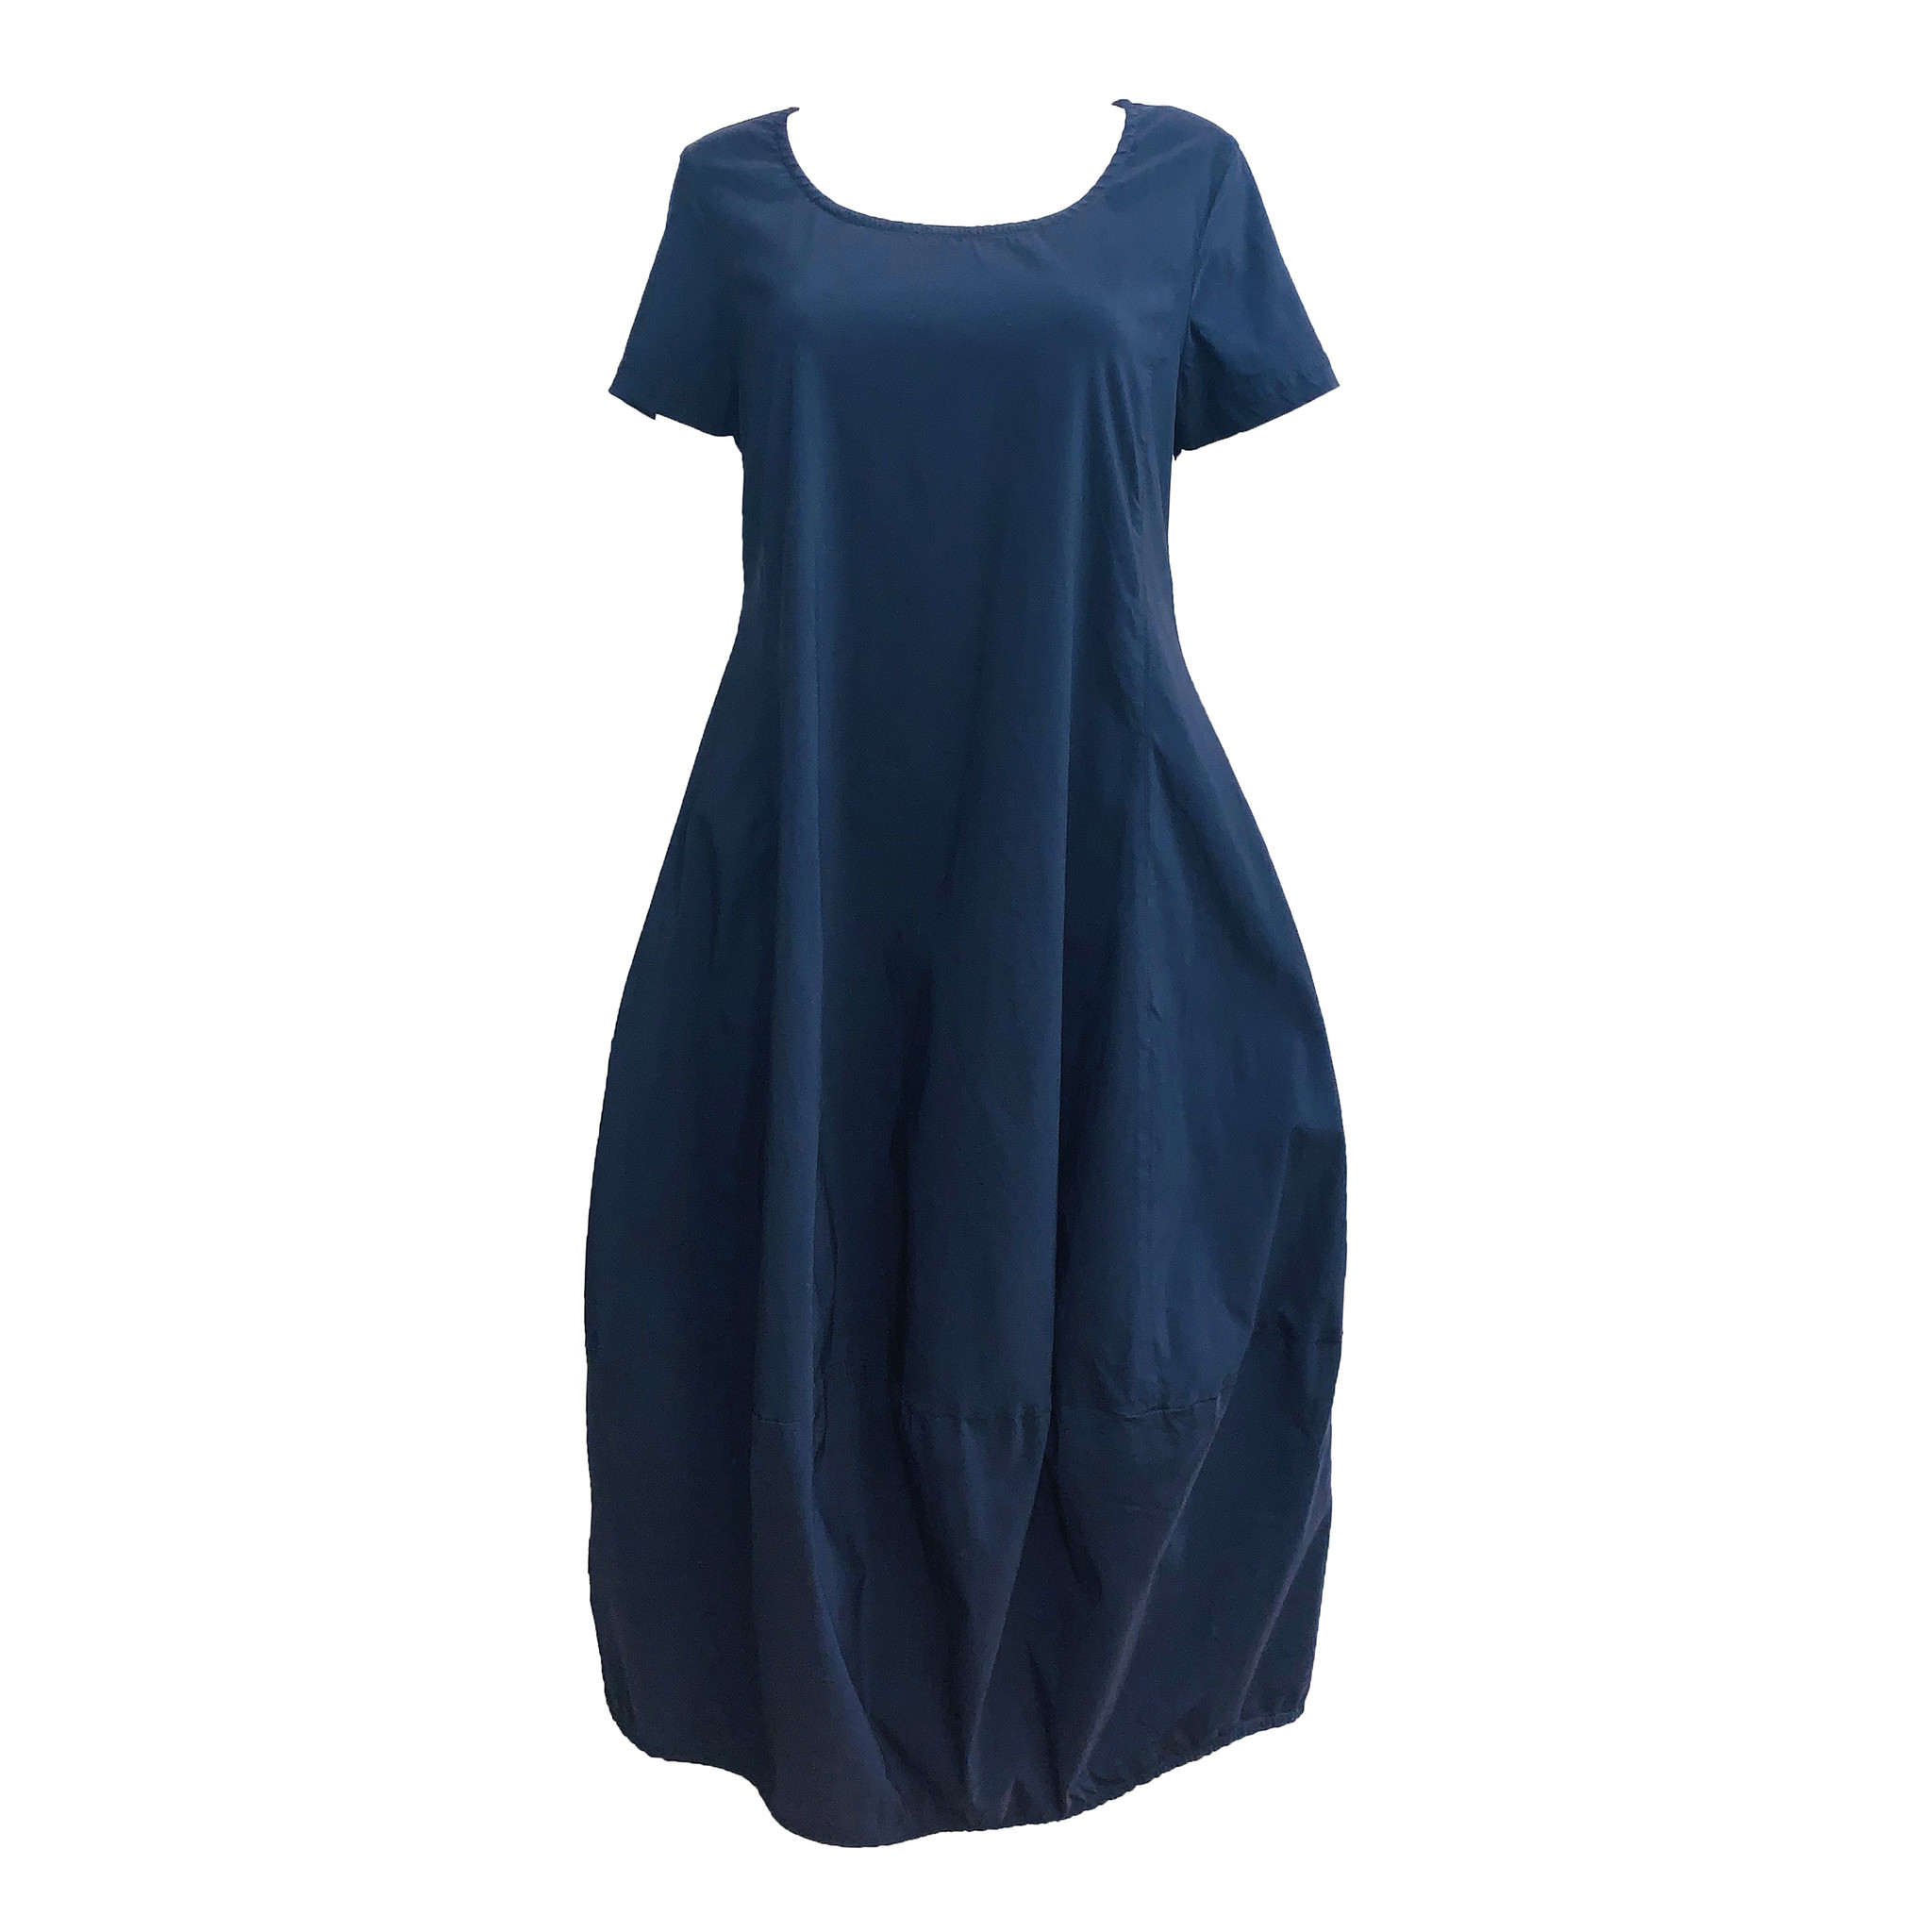 Studio Rundholz Studio Rundholz Short Sleeve Dress - Martinique